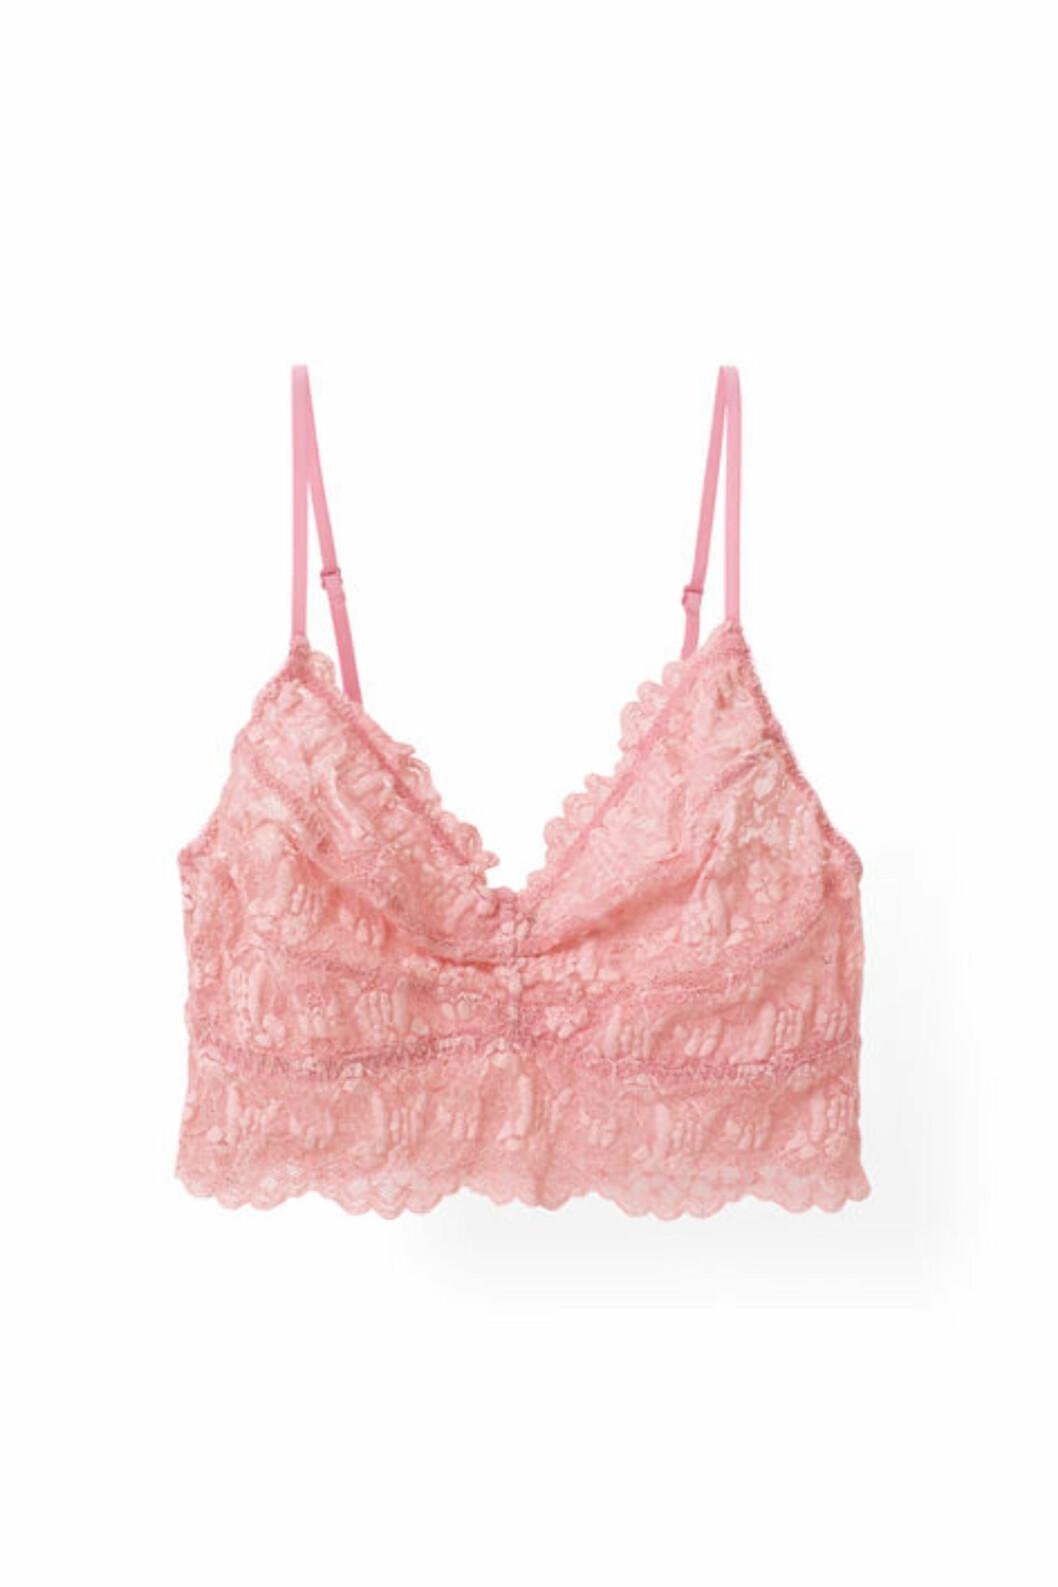 Blondebh fra Ganni | kr 549 | http://www.ganni.com/shop/lingerie/cherry-lace-bra/A0983.html?dwvar_A0983_color=Peony